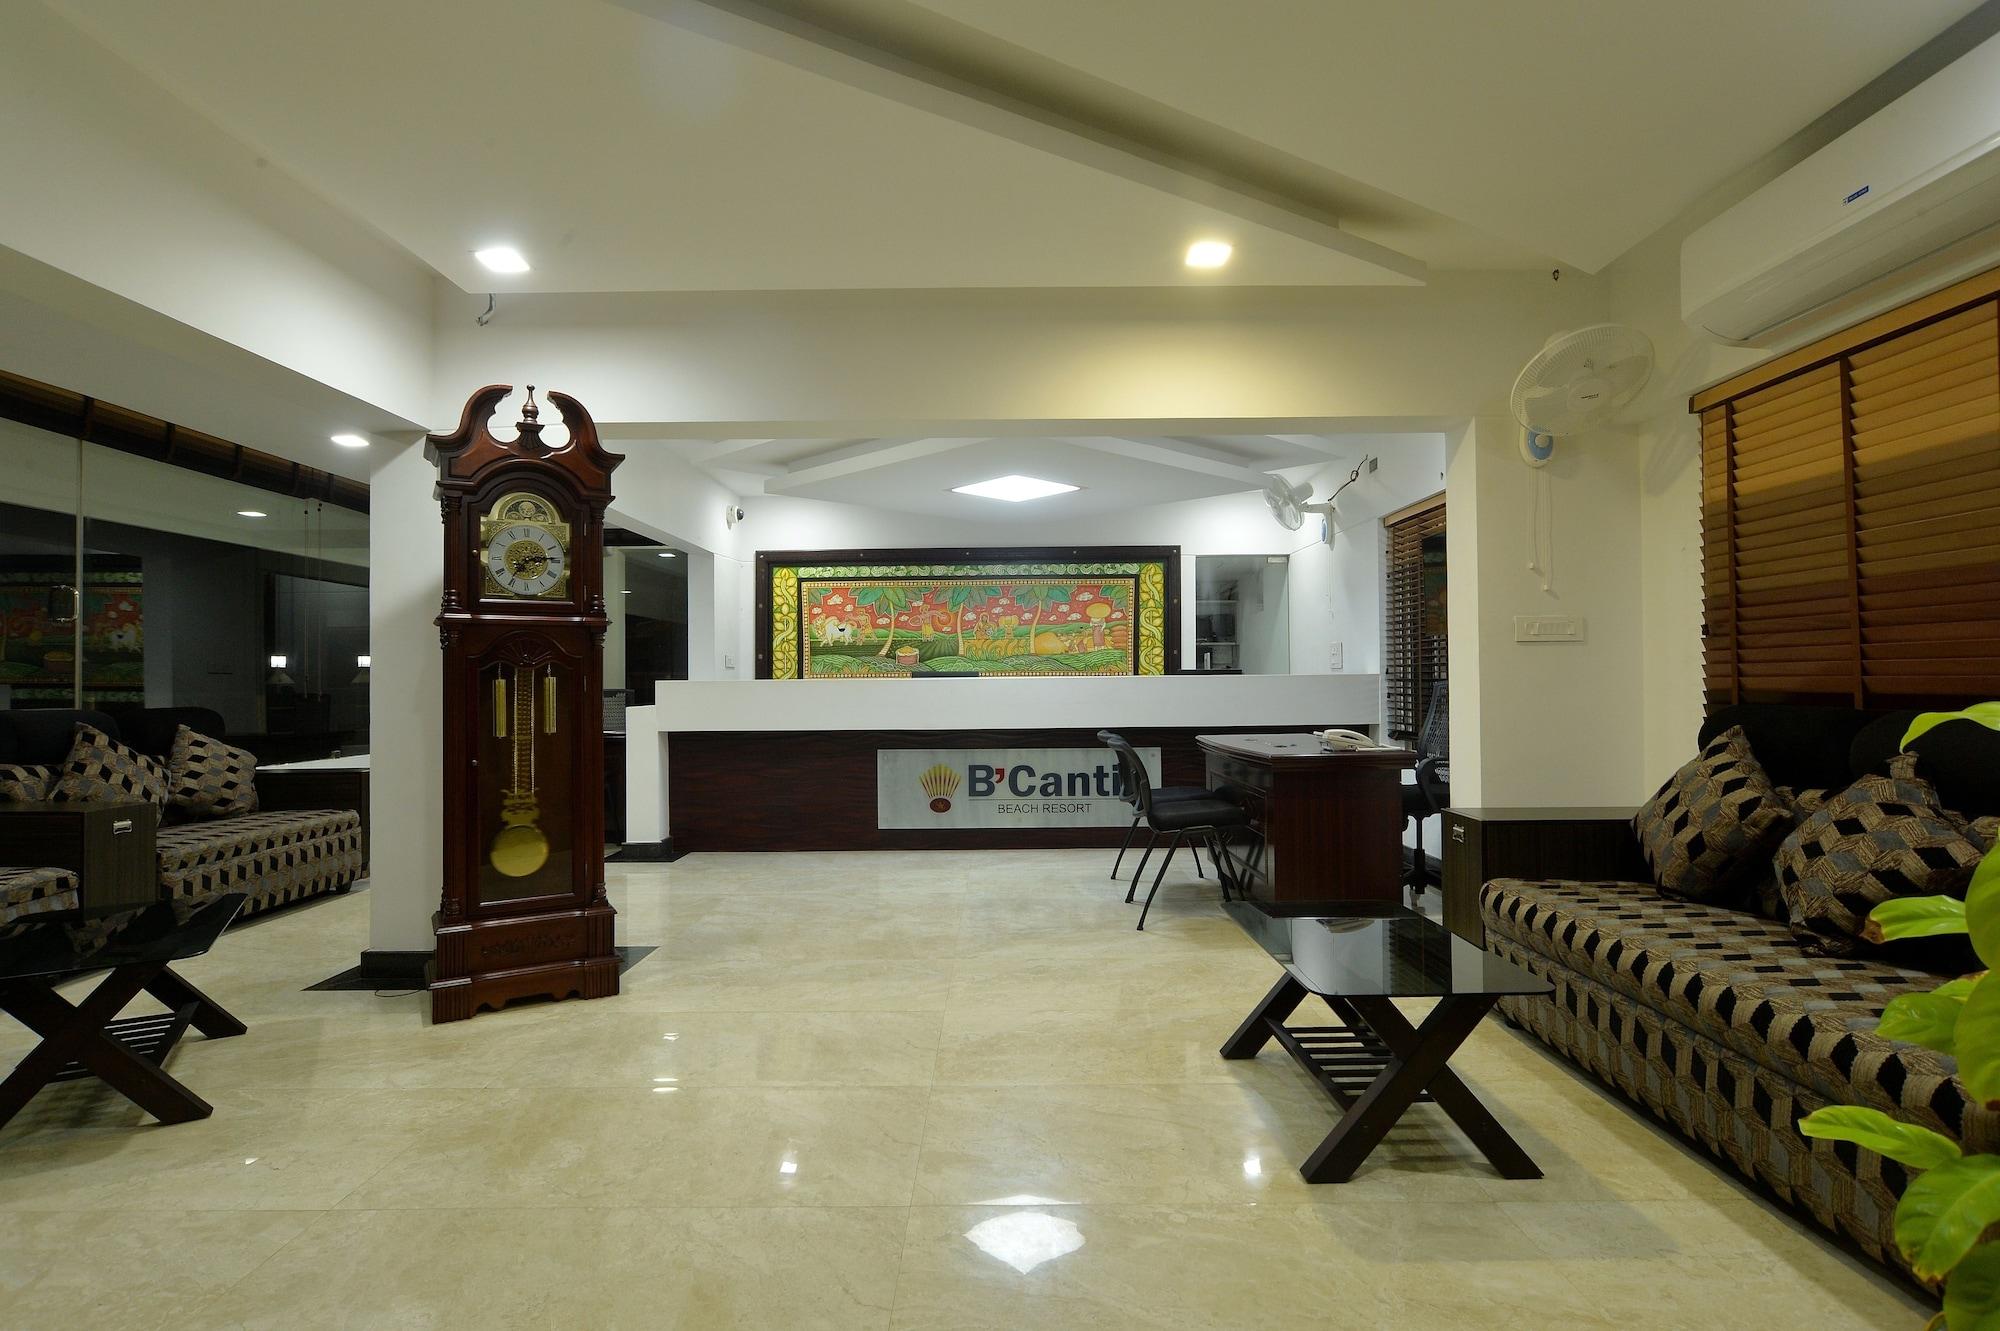 BCanti Boutique Beach Resort, Thiruvananthapuram